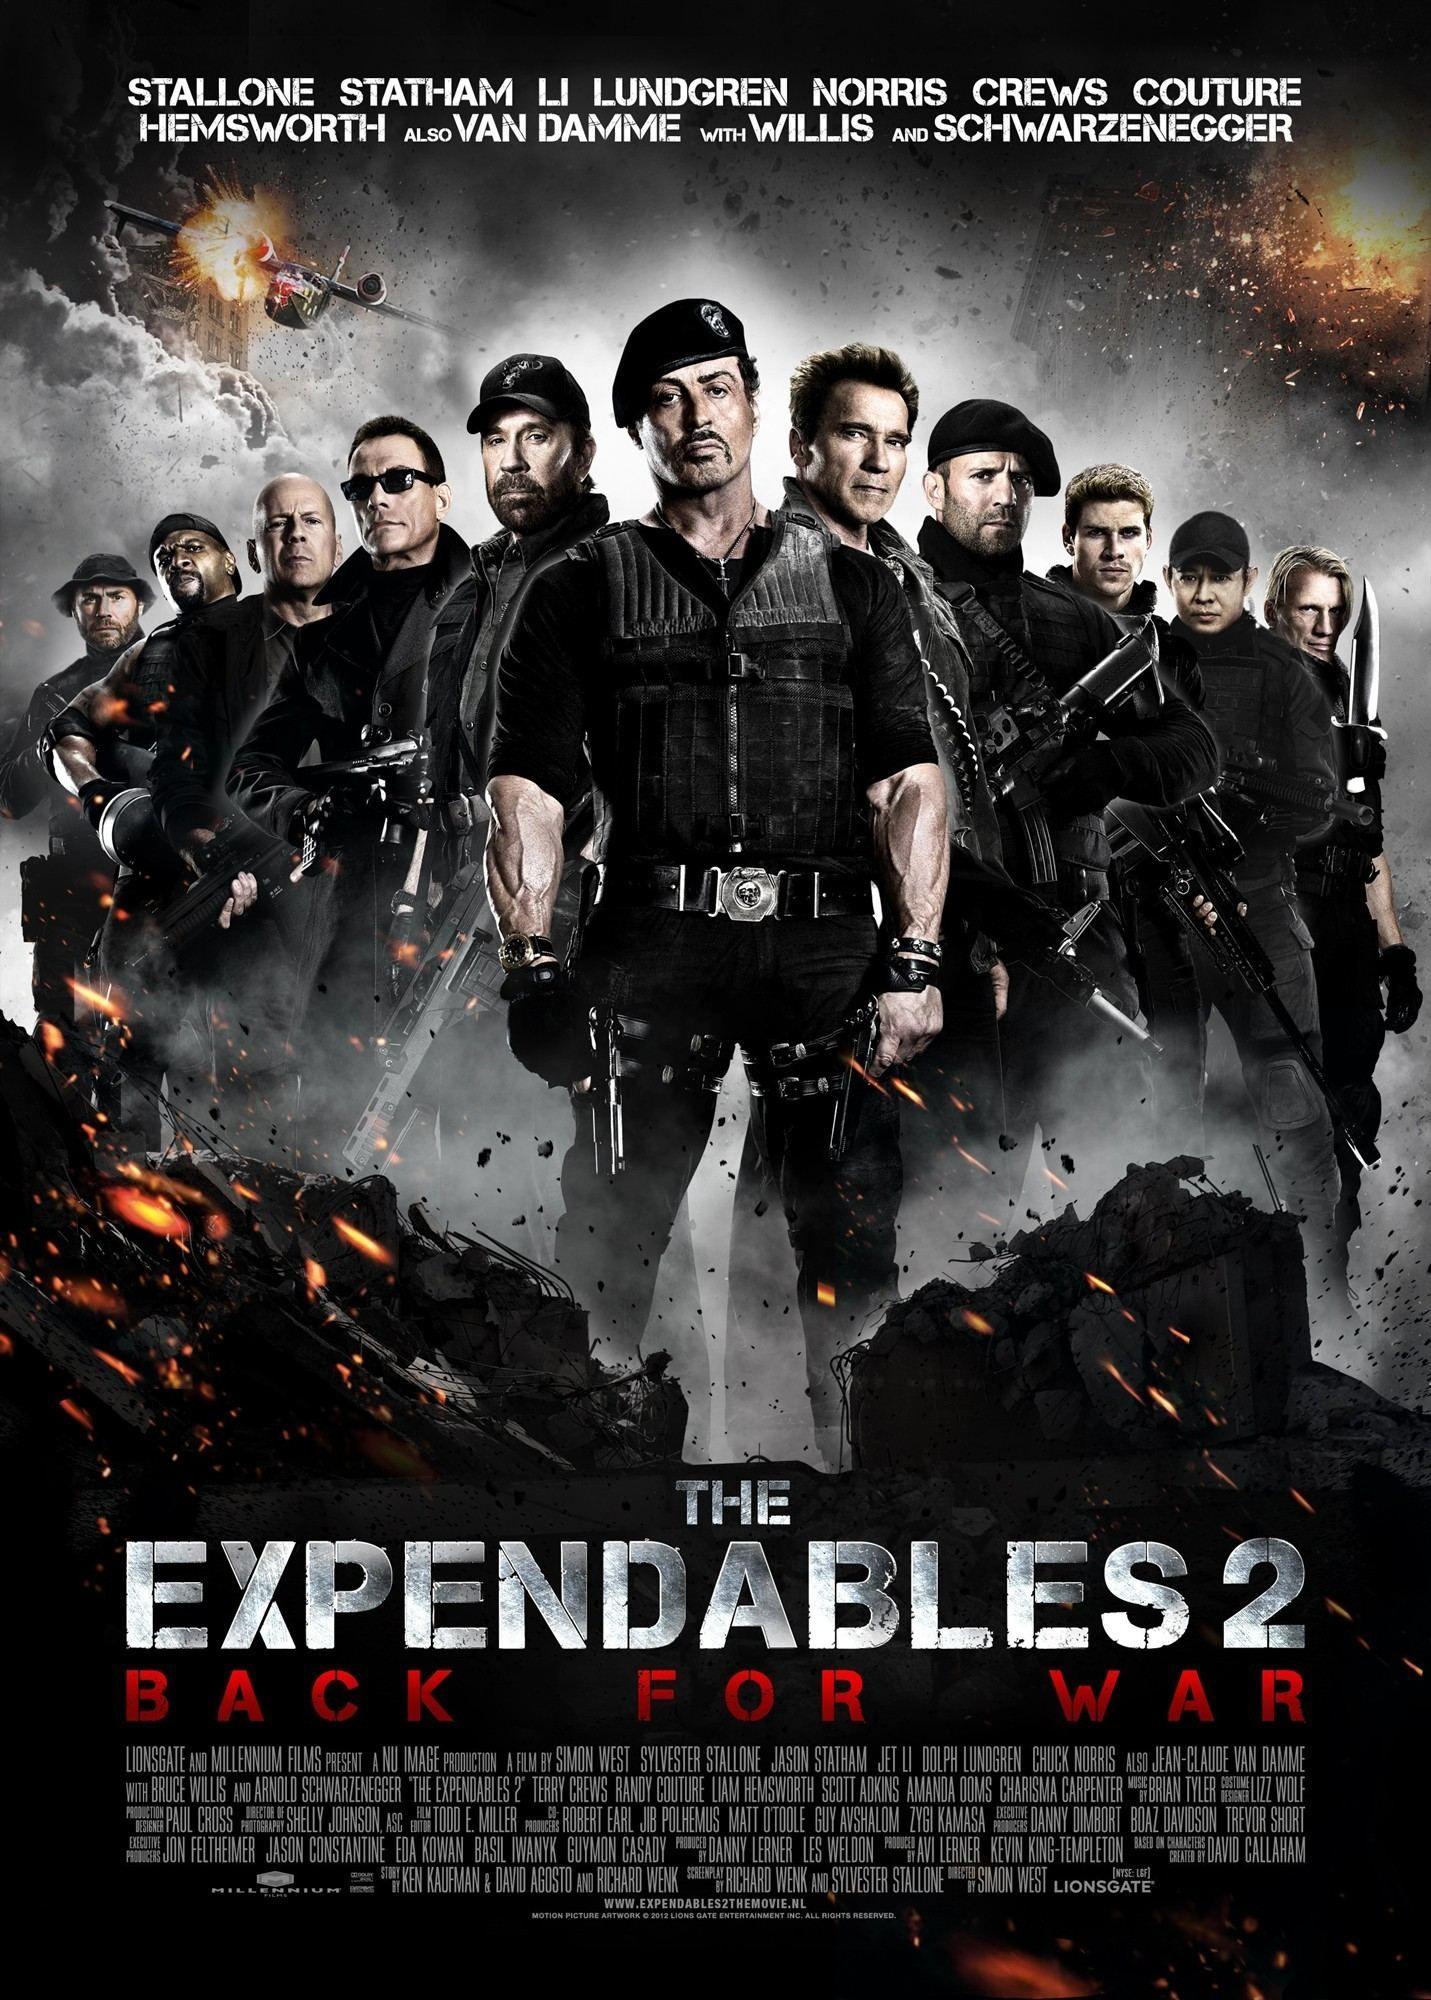 The Expendables 2 2012 Mercenarios 2 Filmes Filmes Epicos